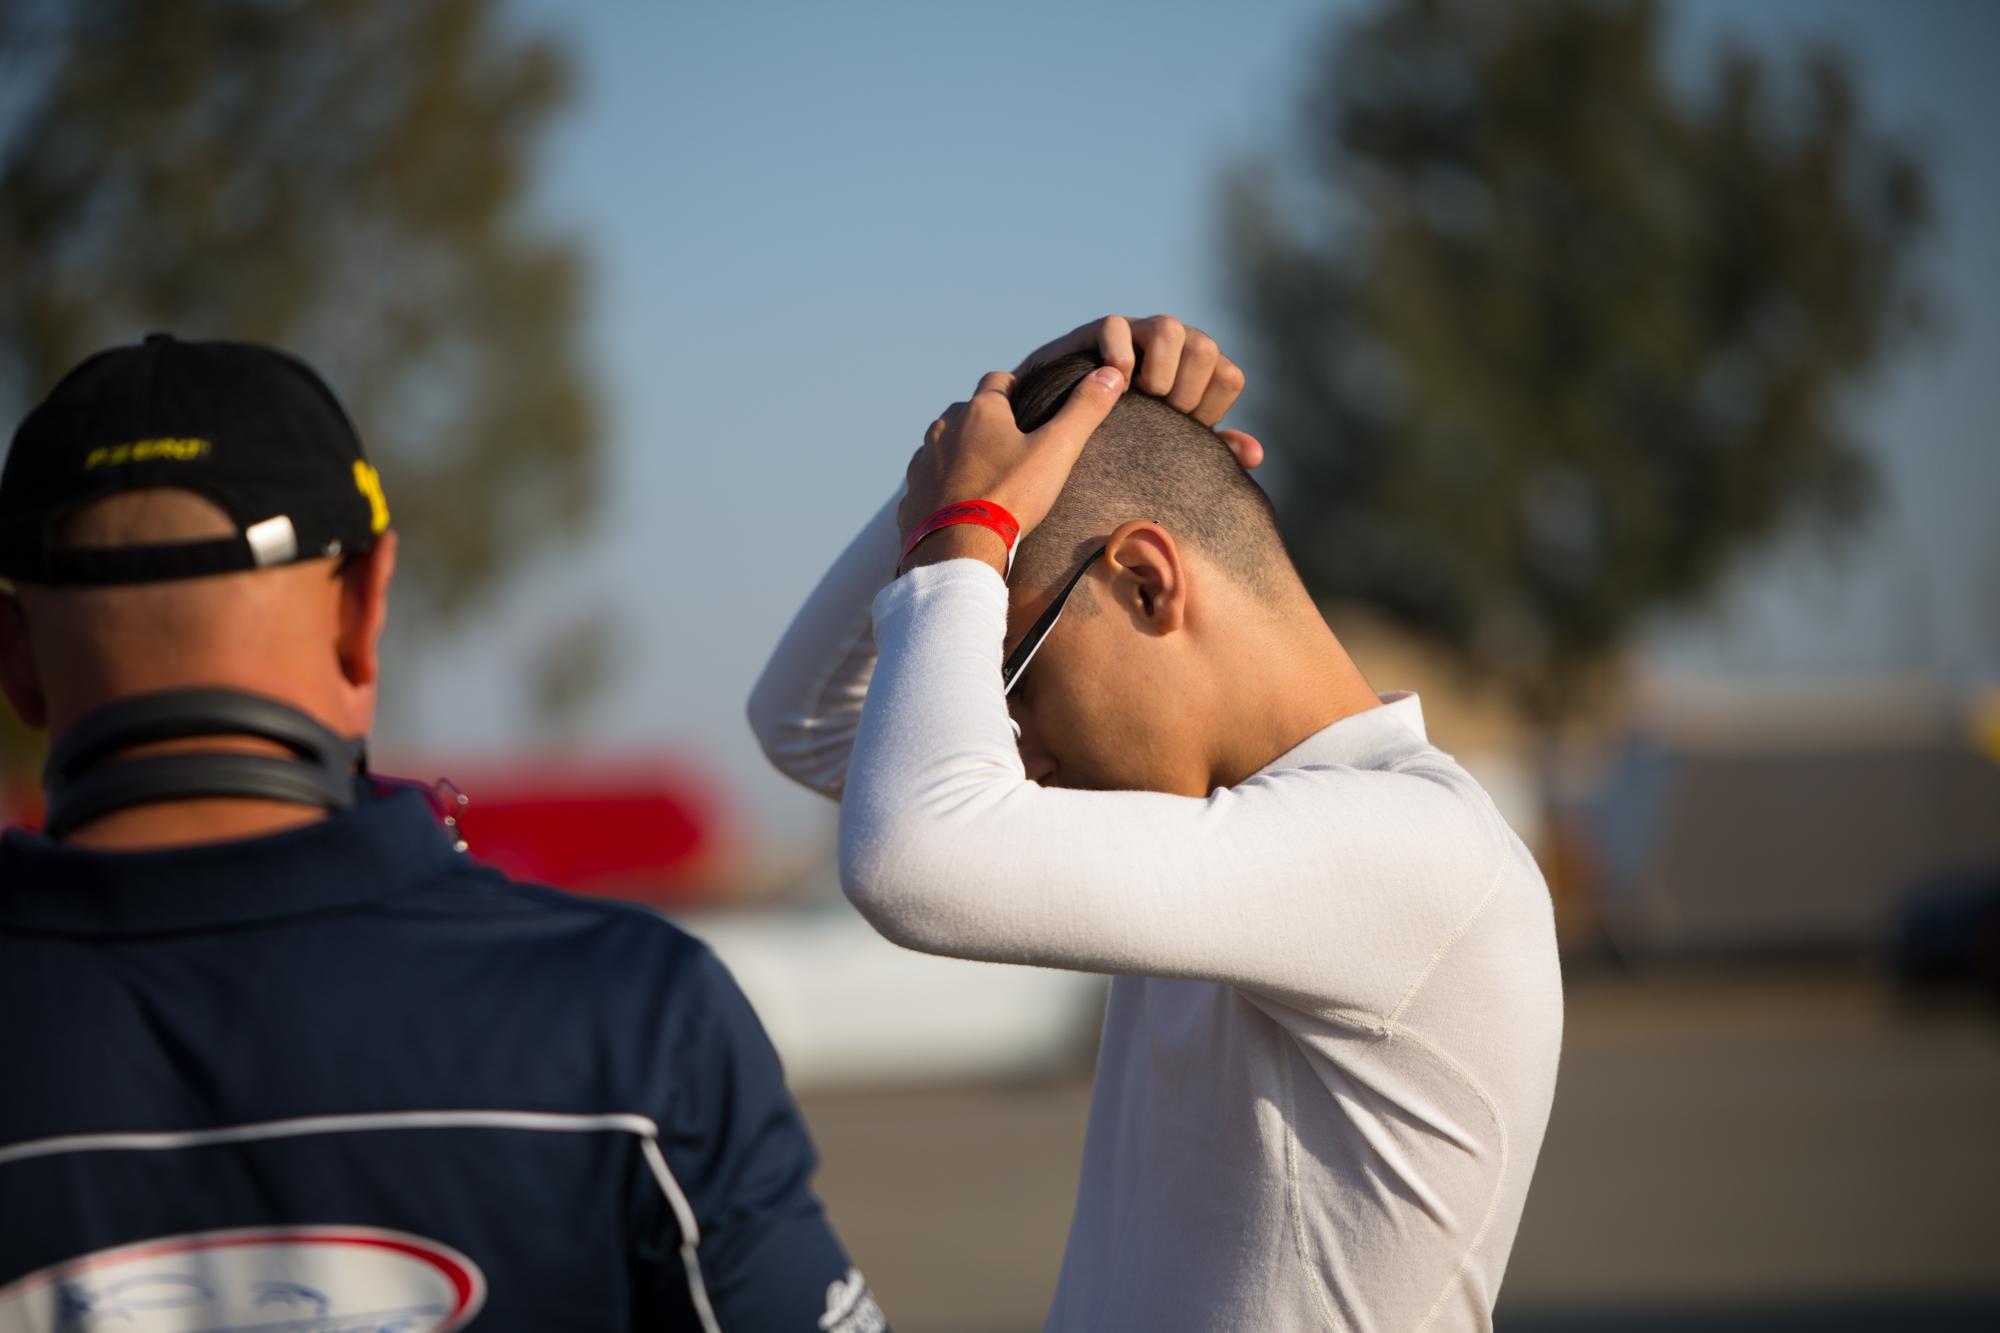 Steven-Racing-20171027-53375.jpg